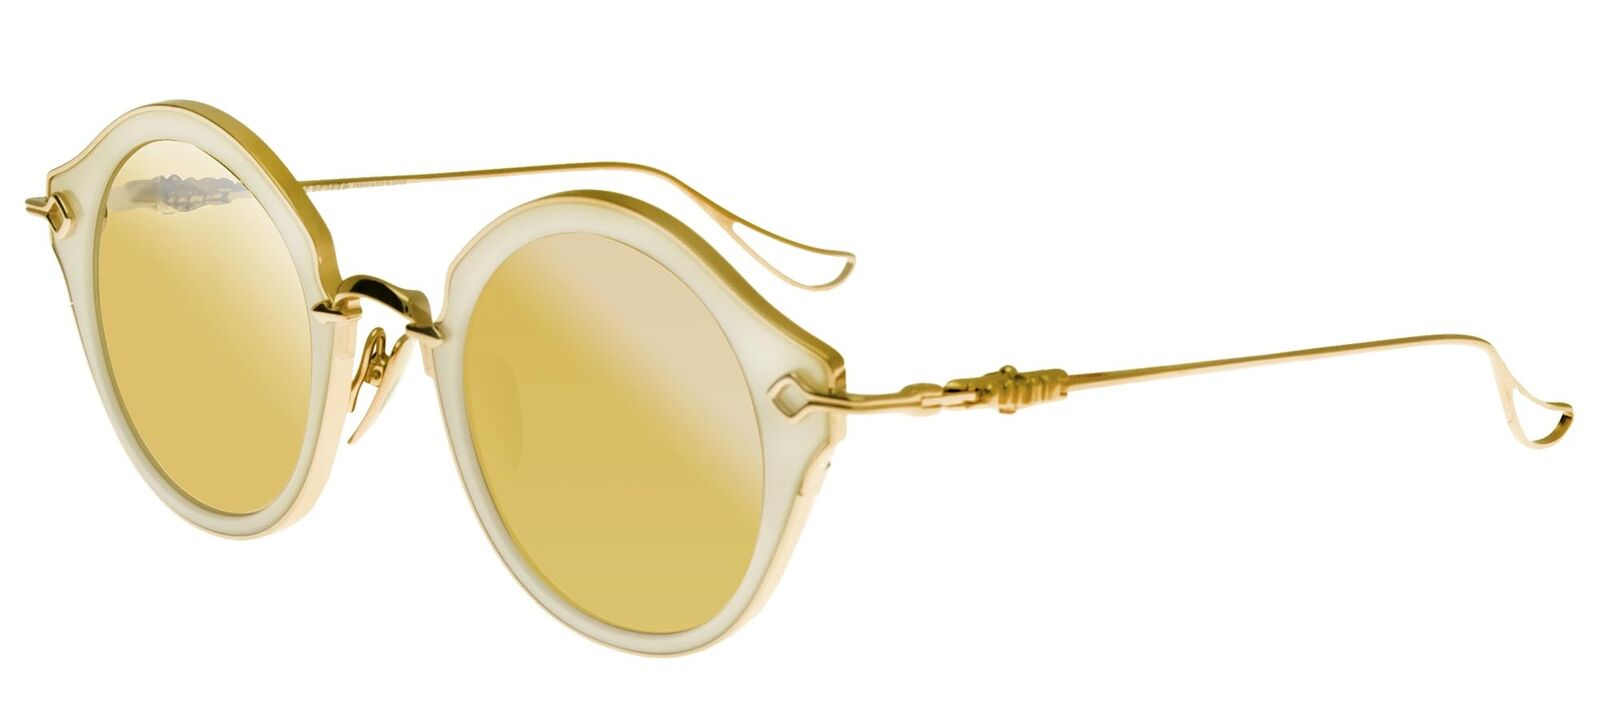 Chrome Hearts BELLA Pearled White Rose Gold/Gold 45/24/133 women Sunglasses